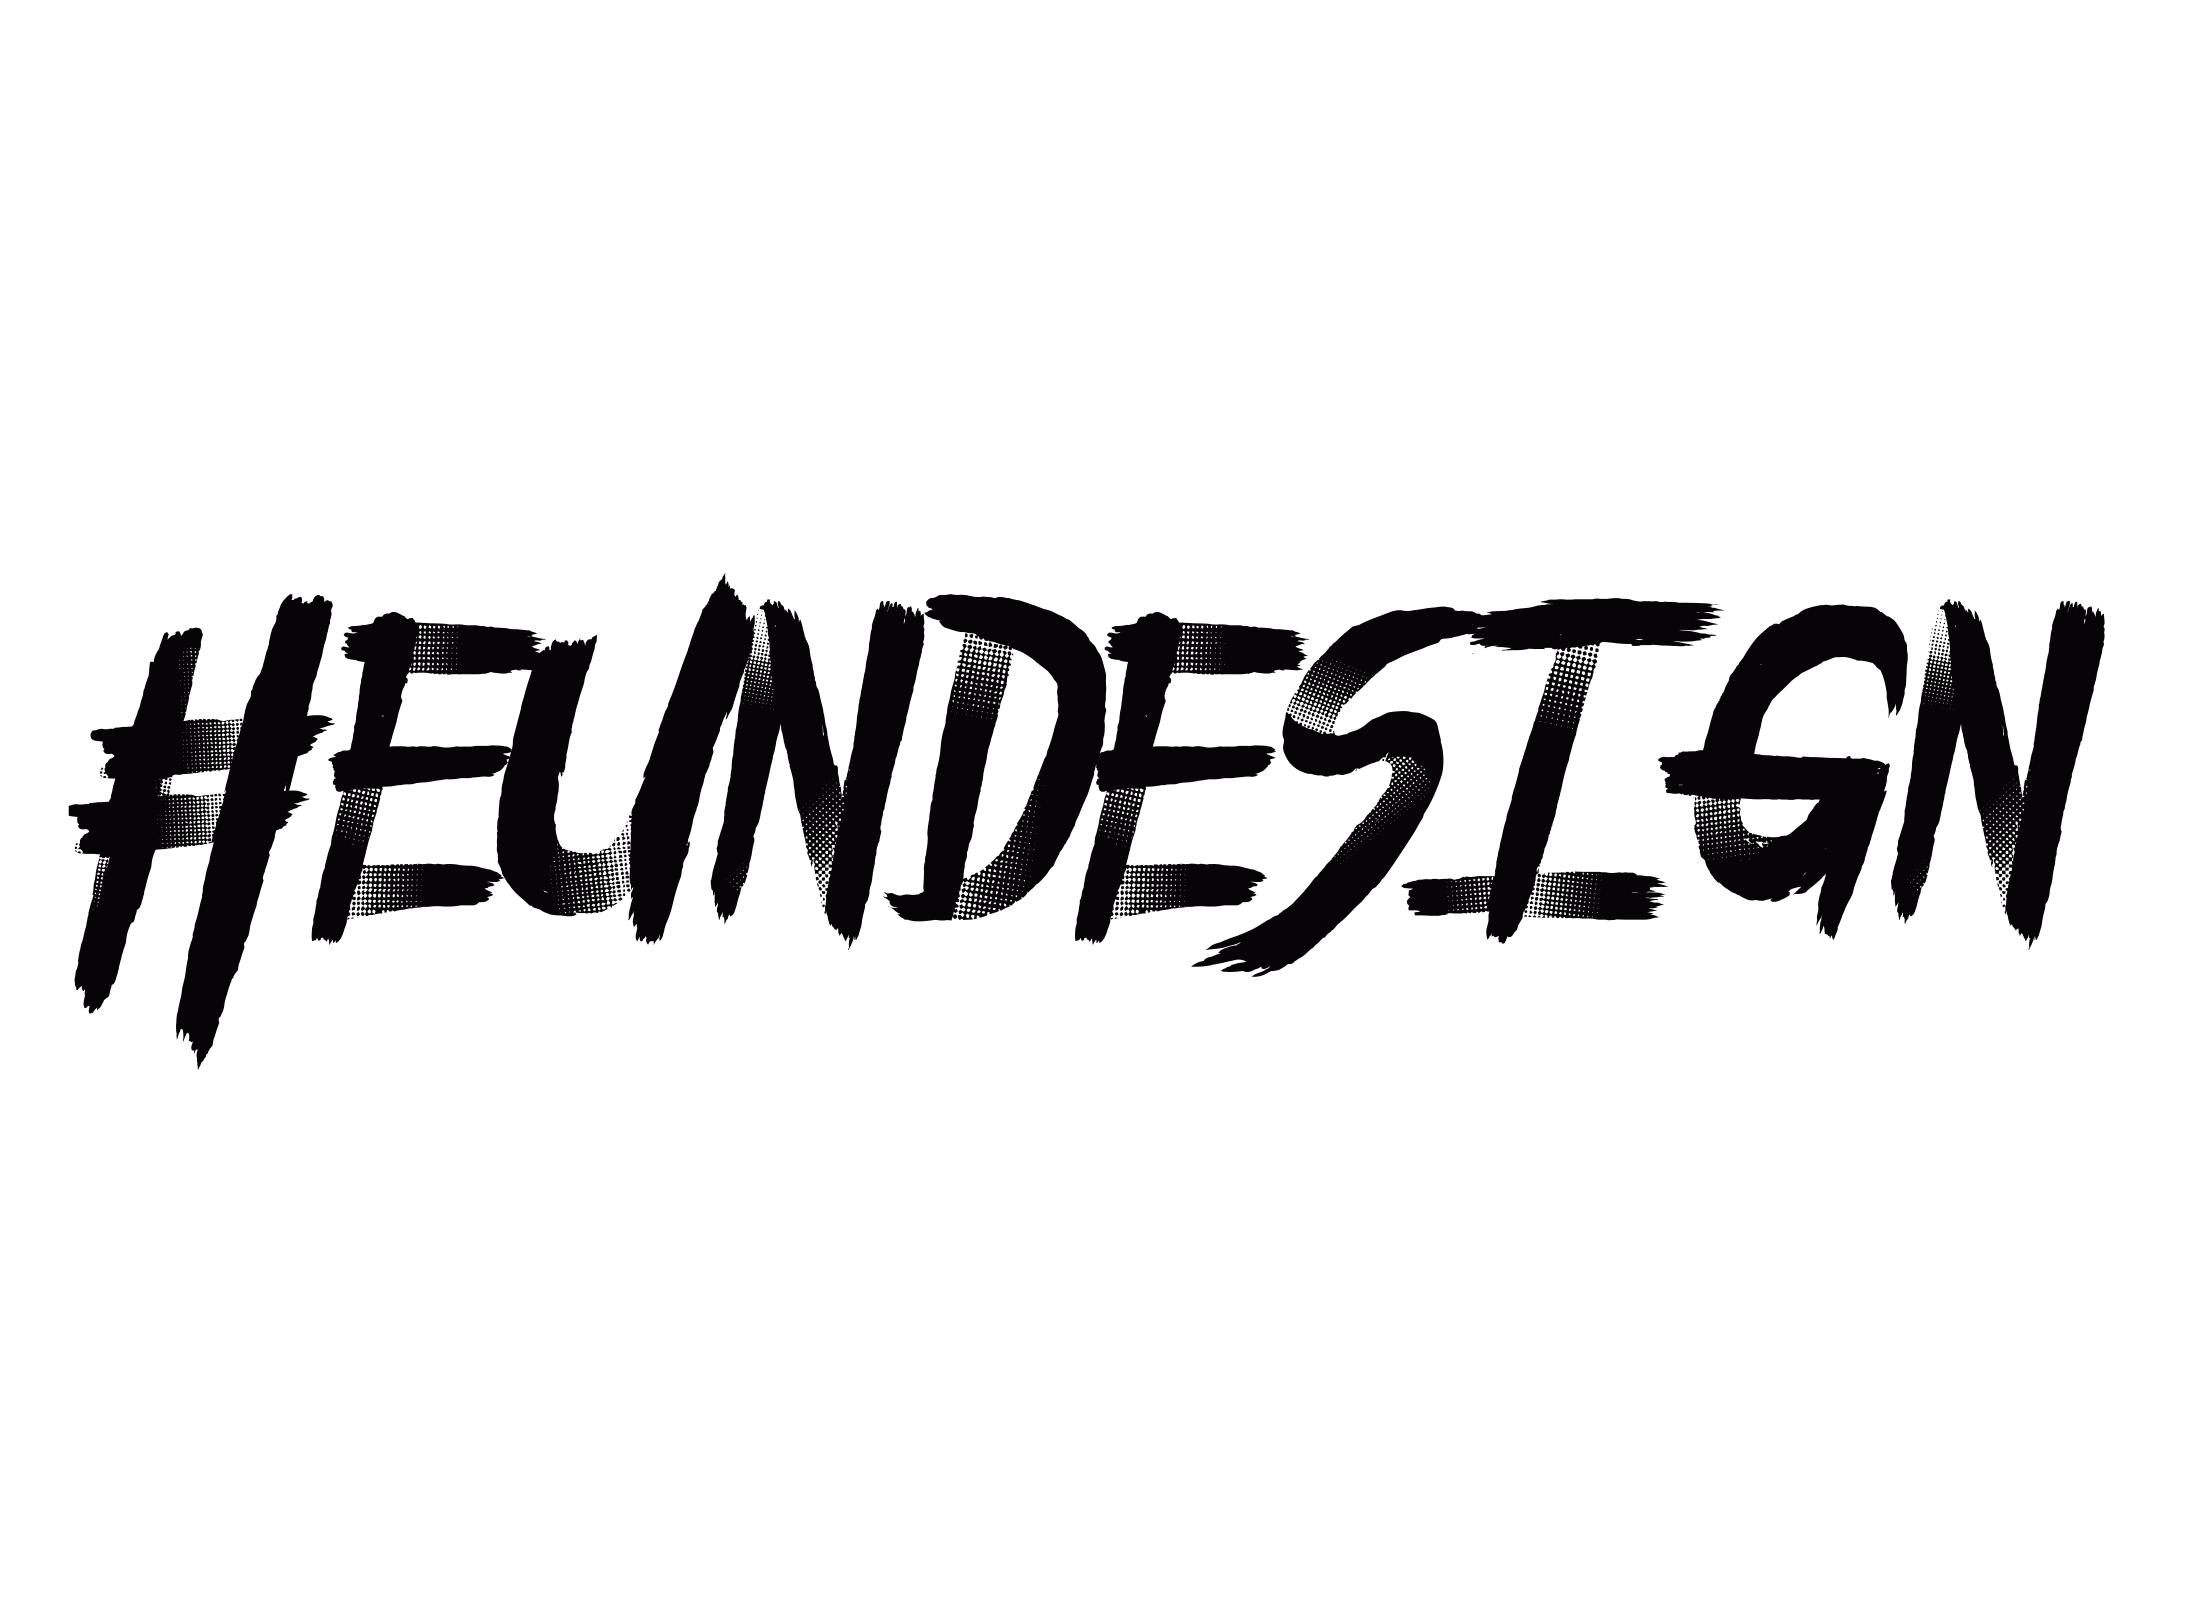 Heundesign